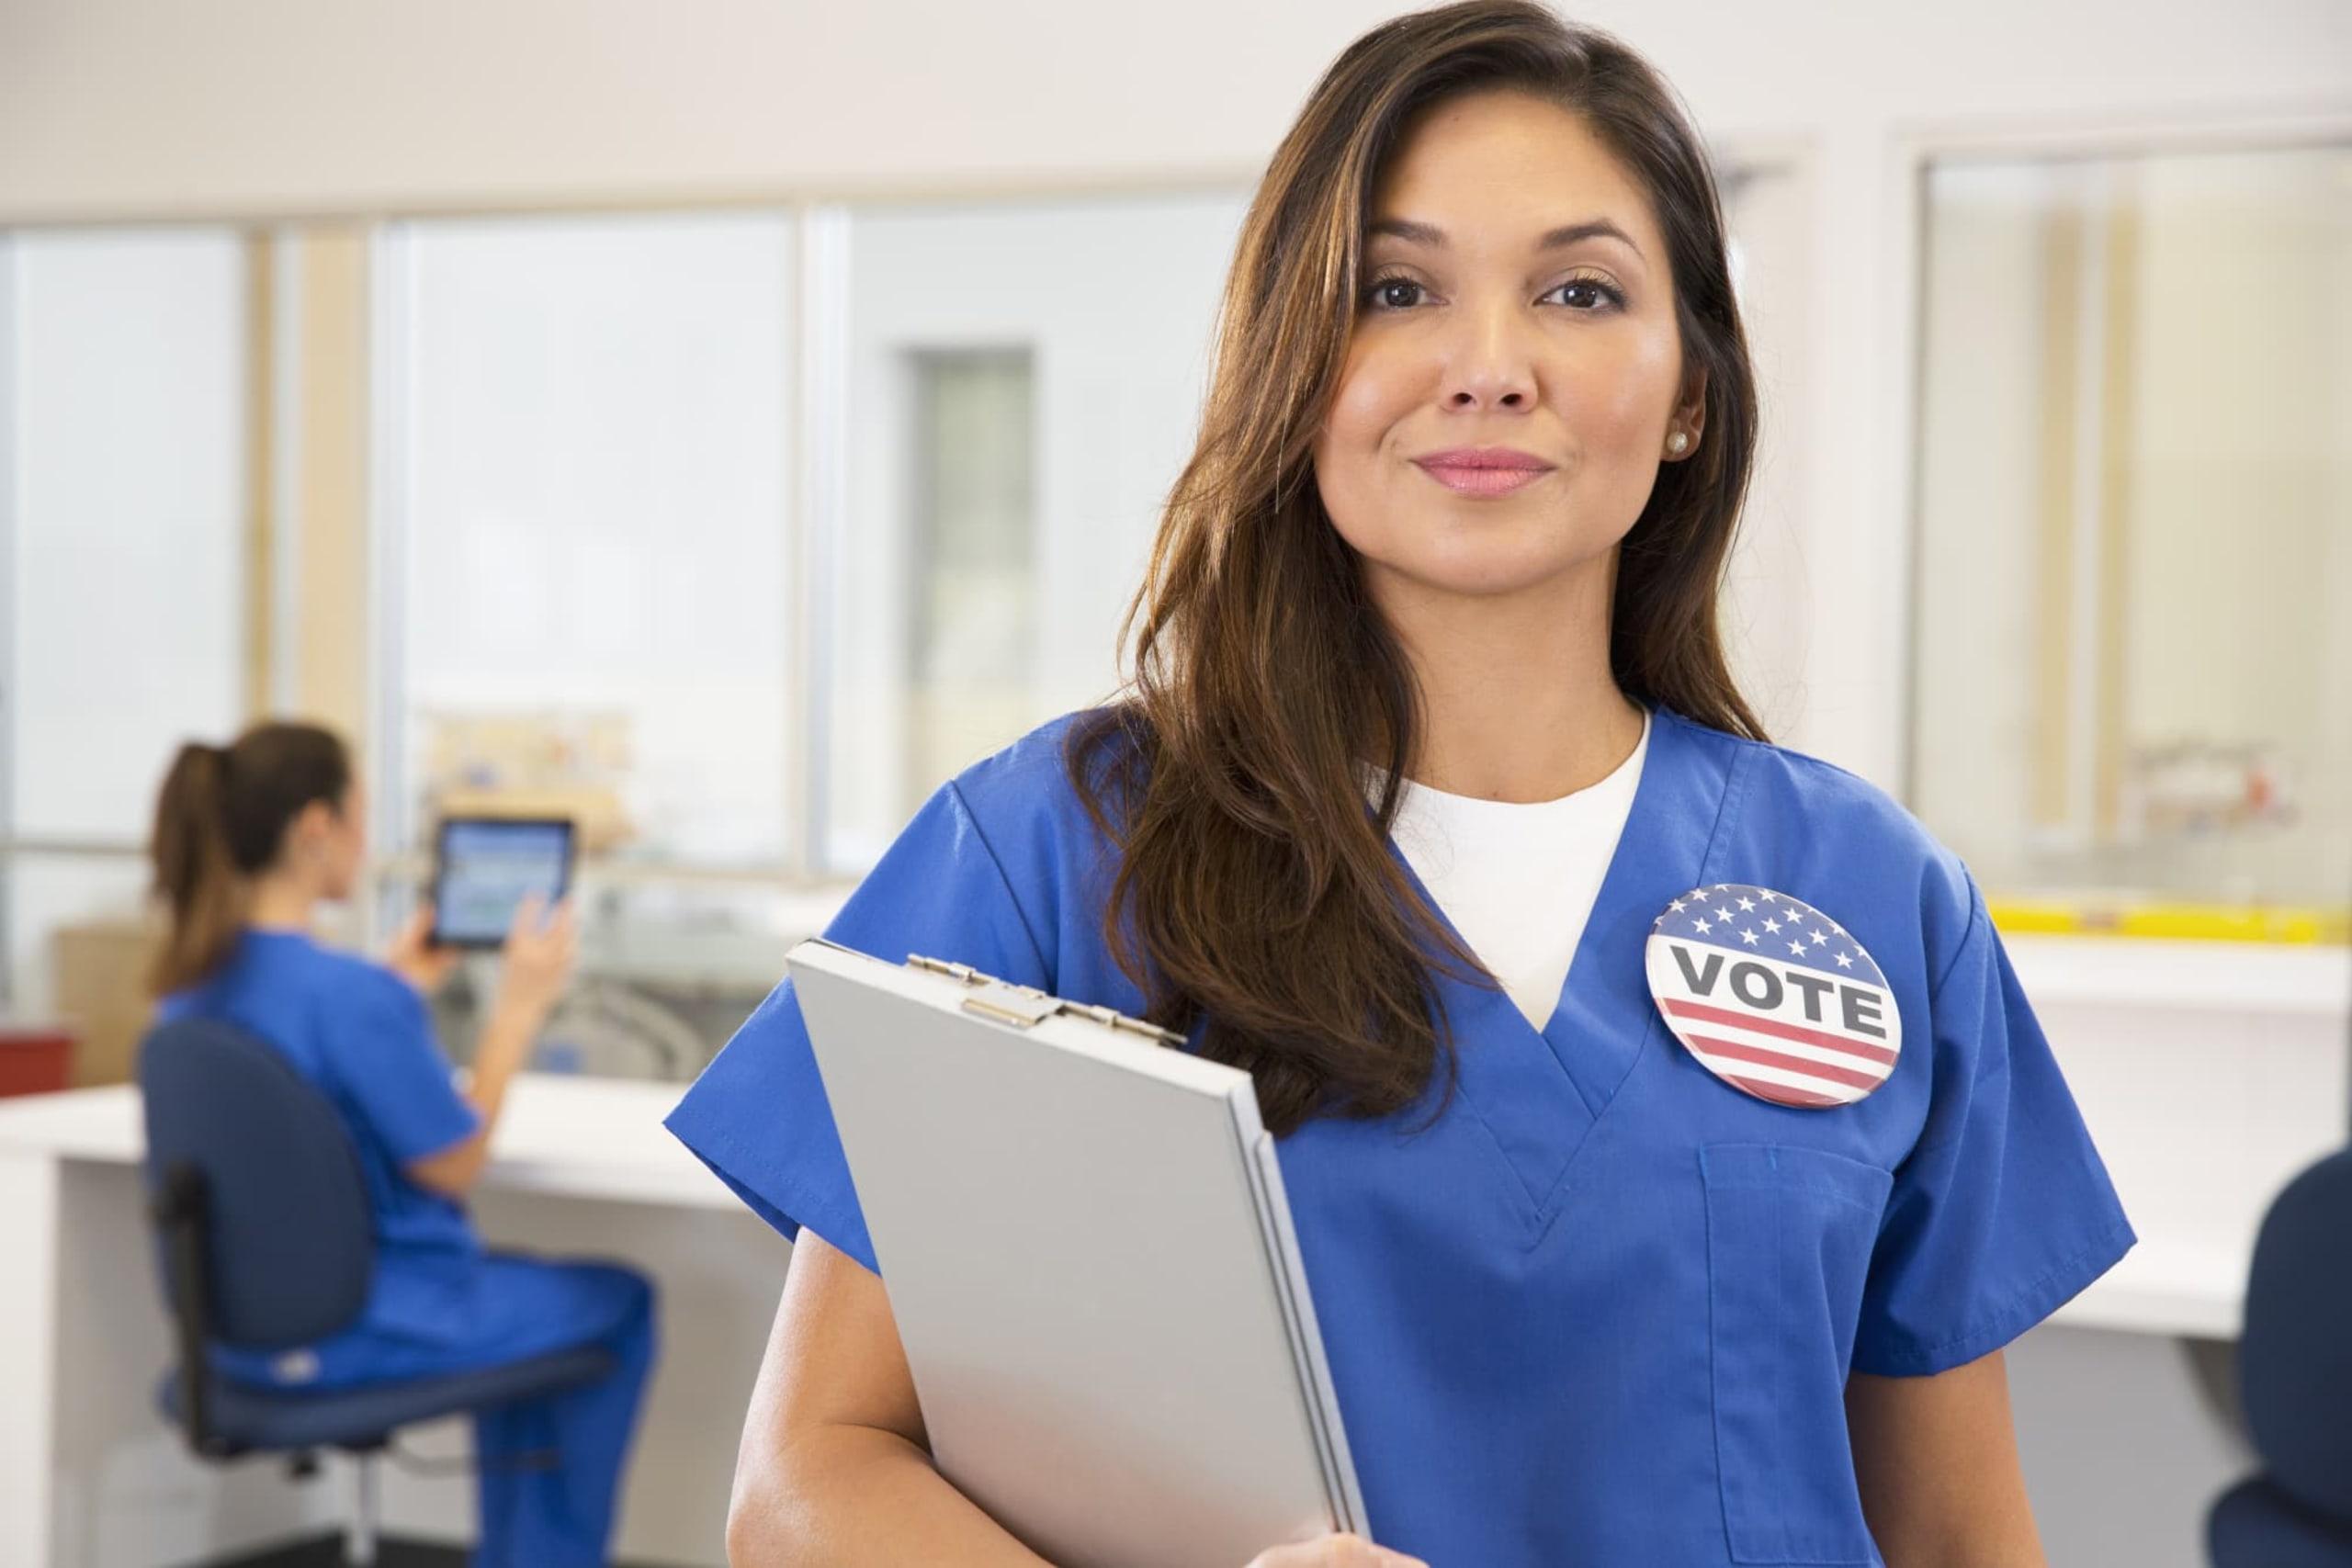 How Nurses Can Promote Civic Engagement